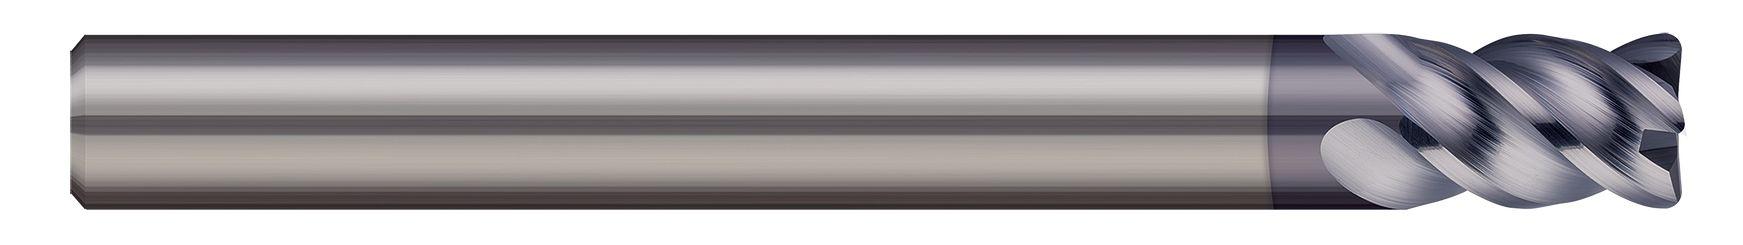 End Mills for Hardened Steels - Corner Radius - 4 Flute